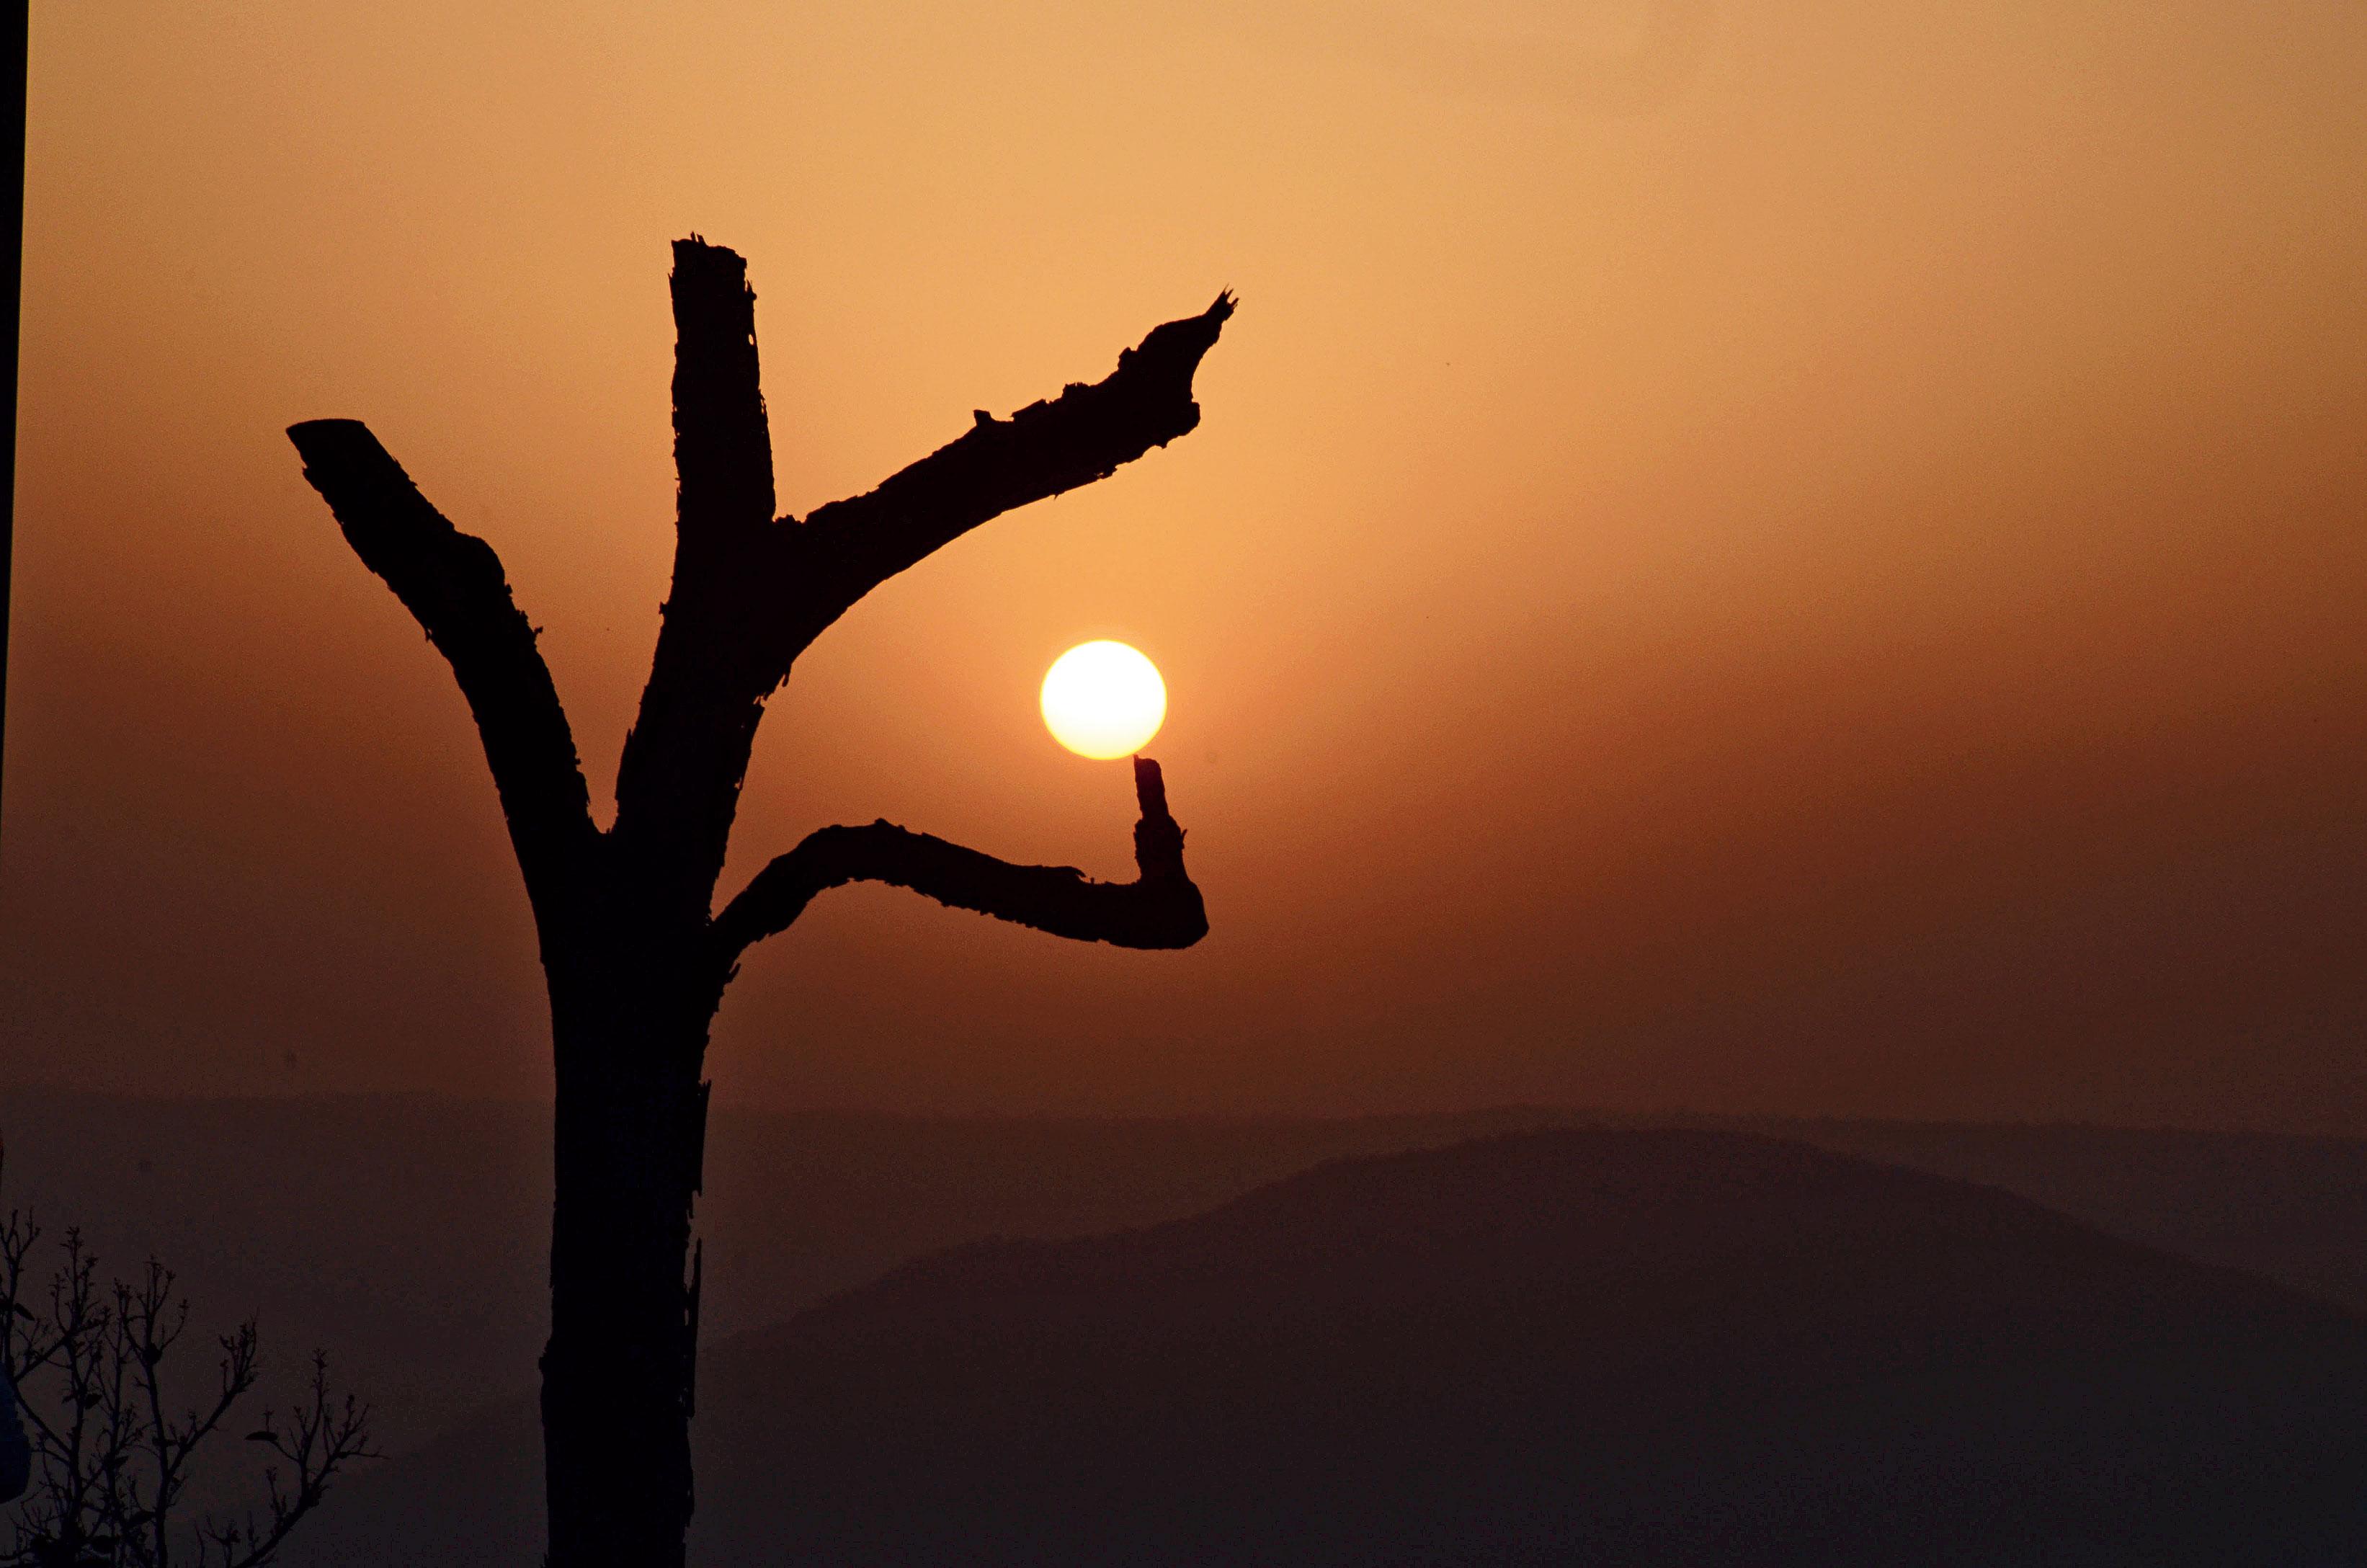 The sun sets at Netarhat in Latehar.